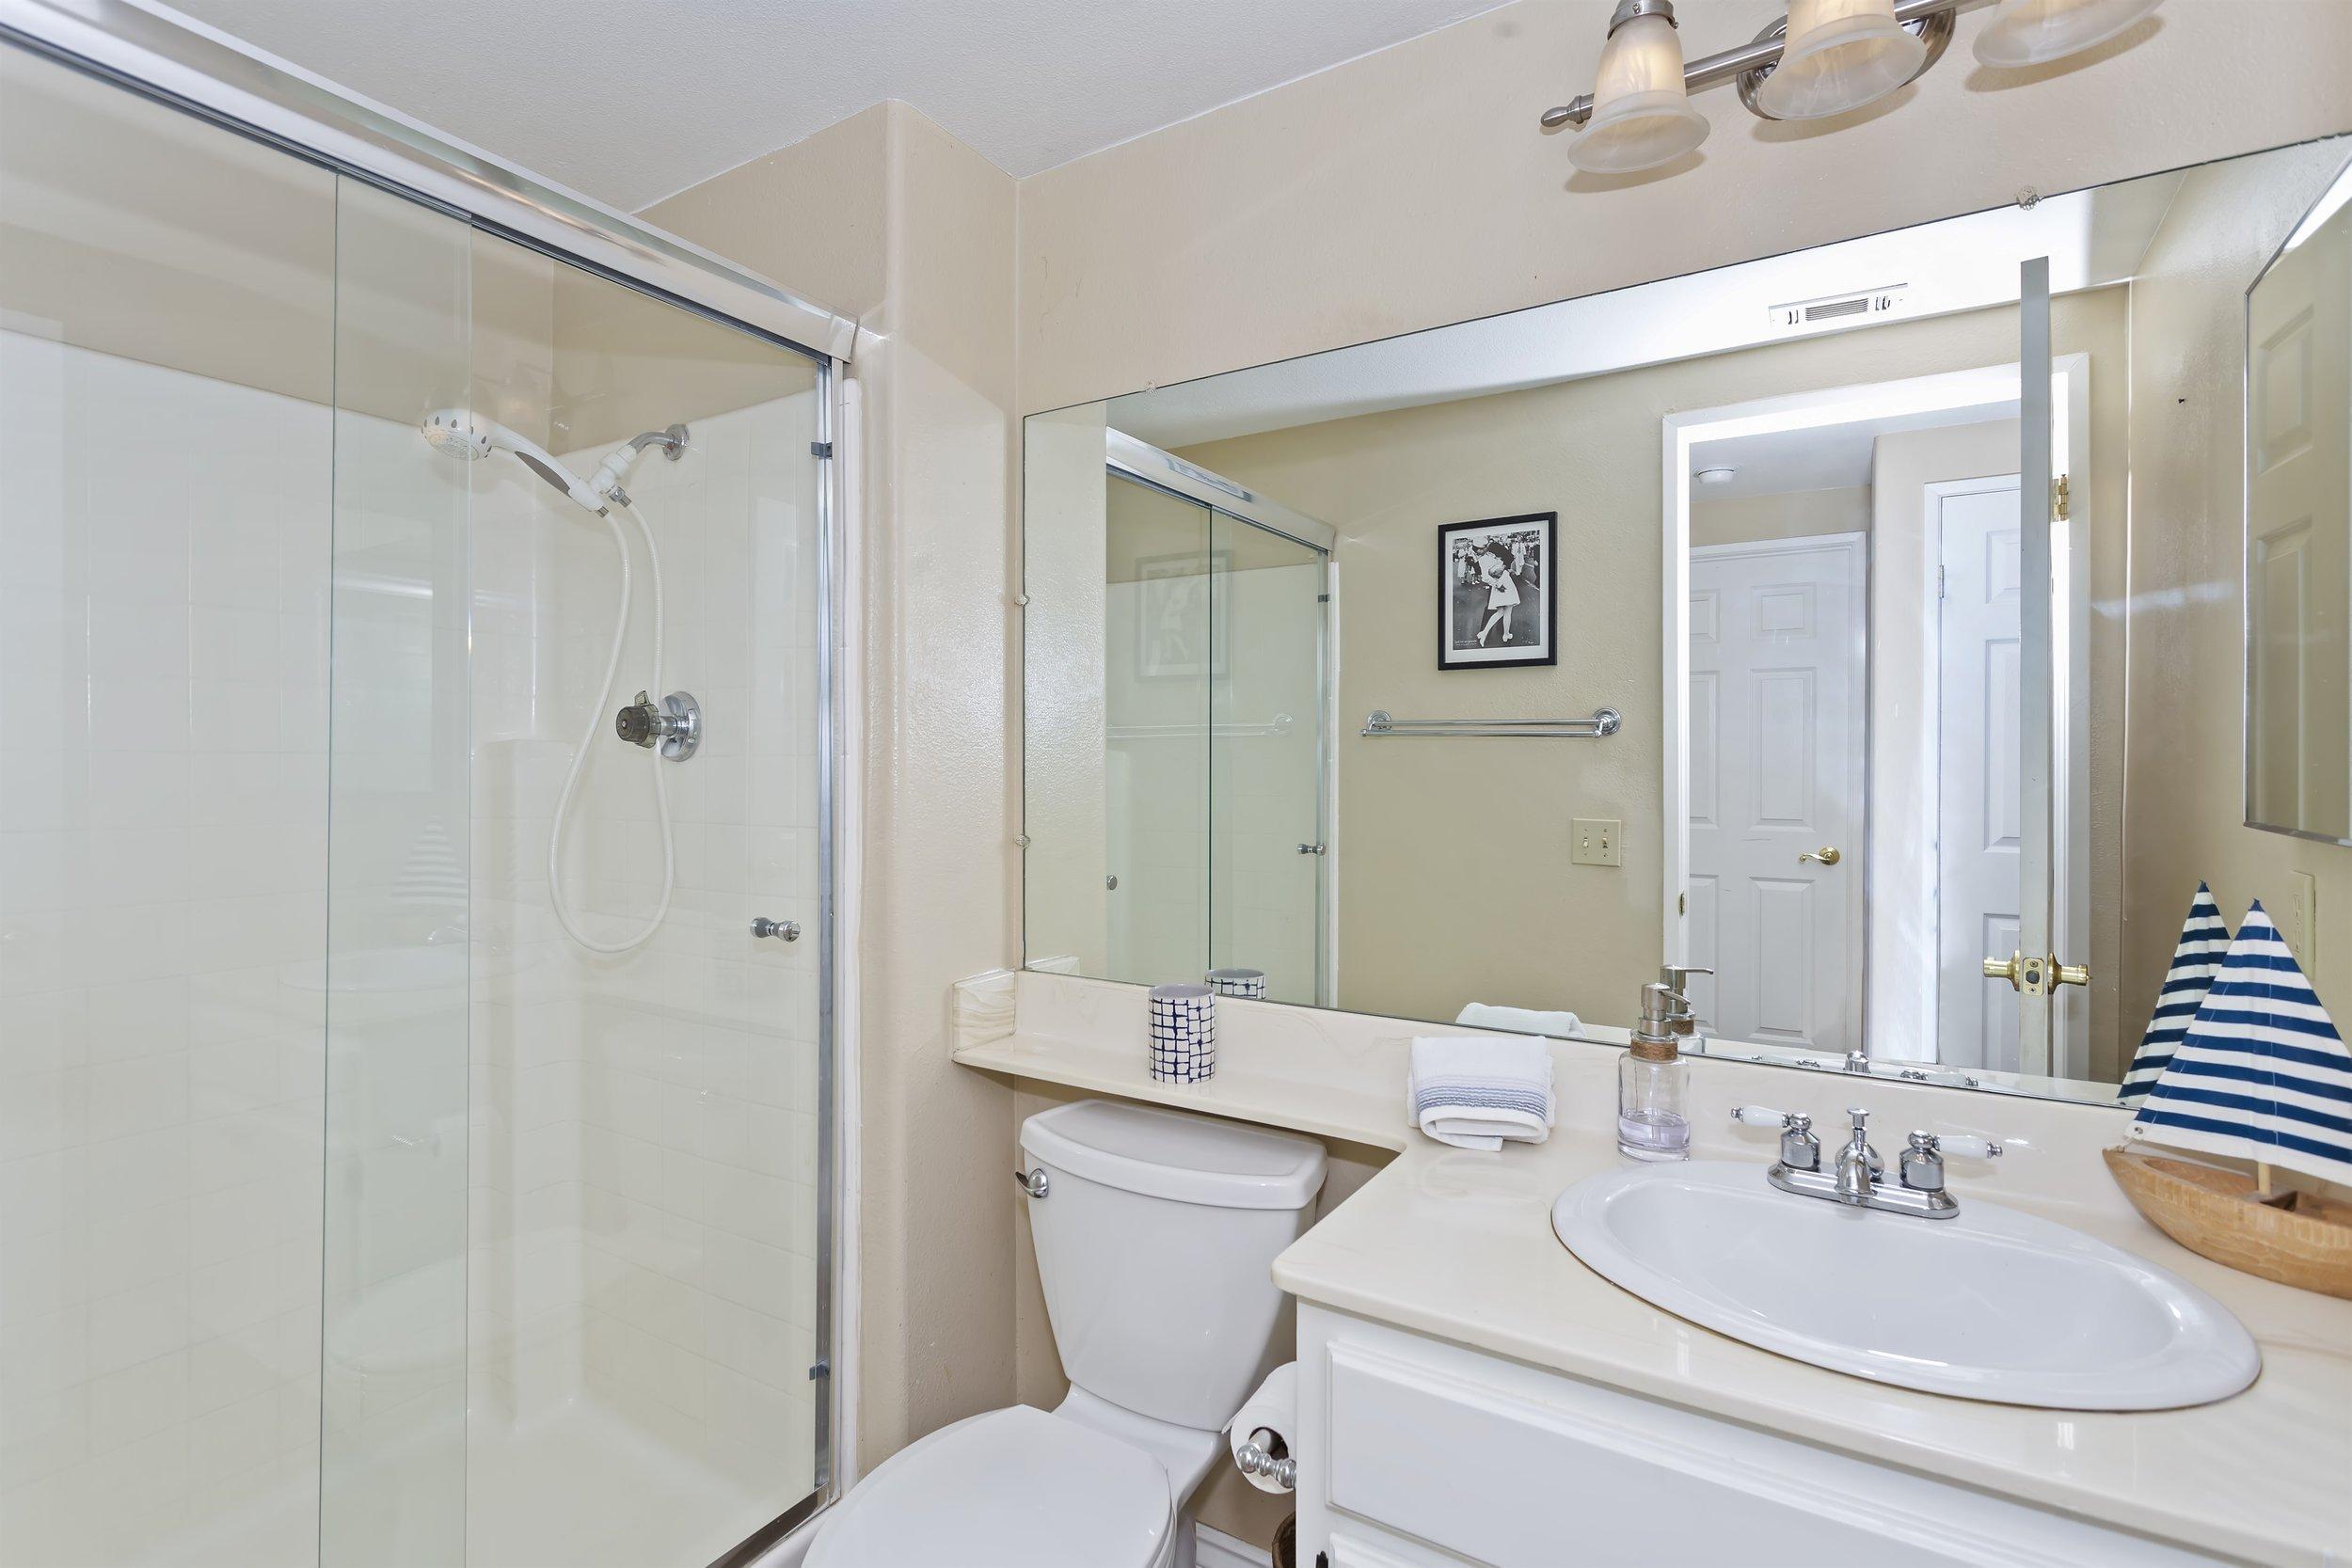 020_Bathroom.jpg